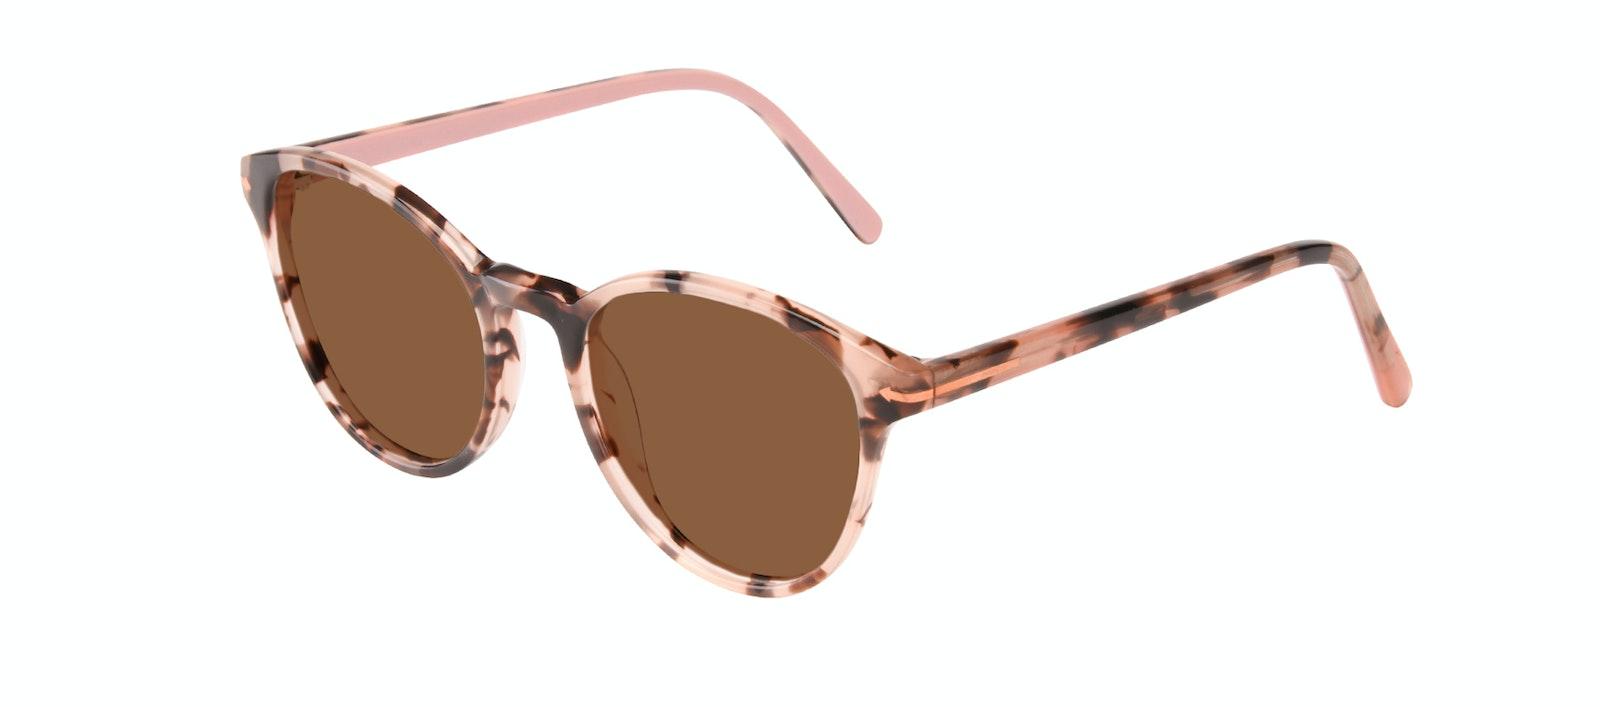 Affordable Fashion Glasses Round Sunglasses Women London Wisteria Tilt